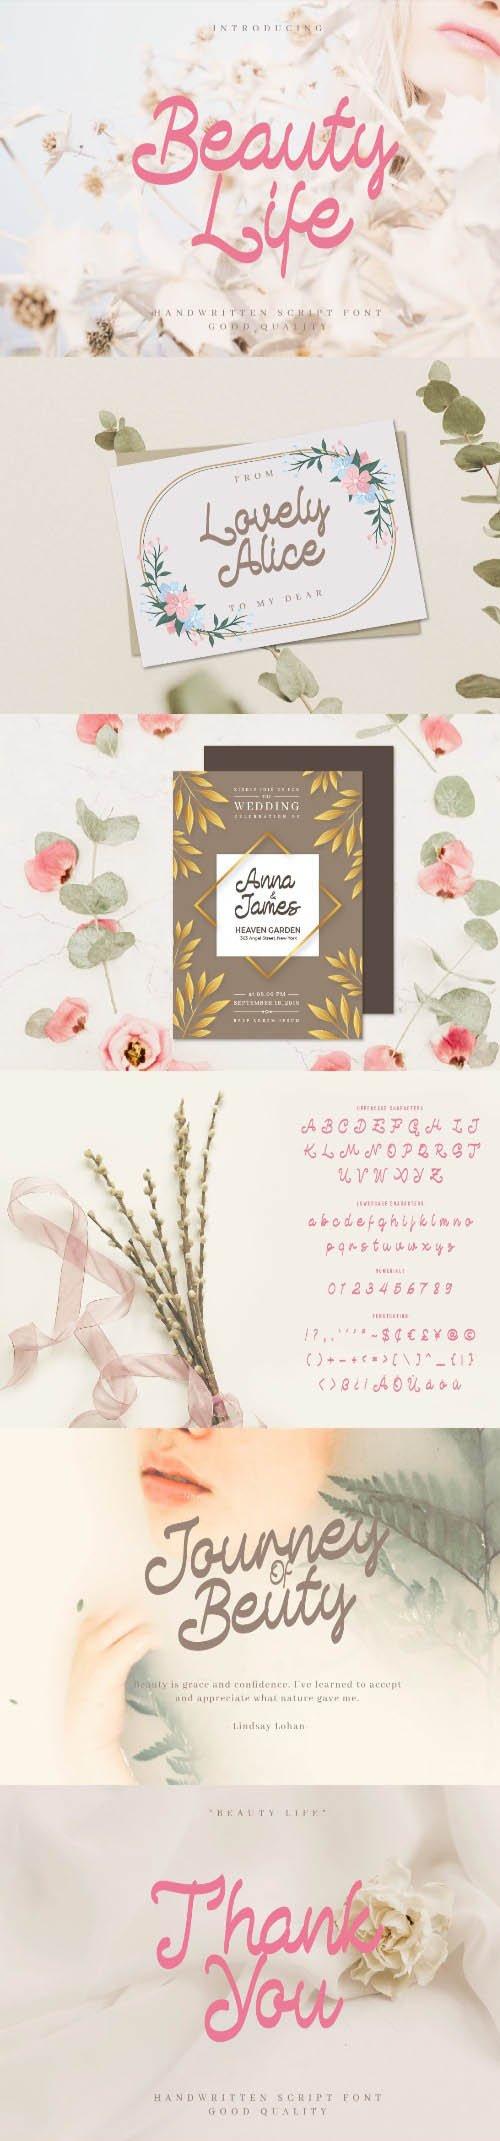 Beauty Life - Romantic Handwritten Script